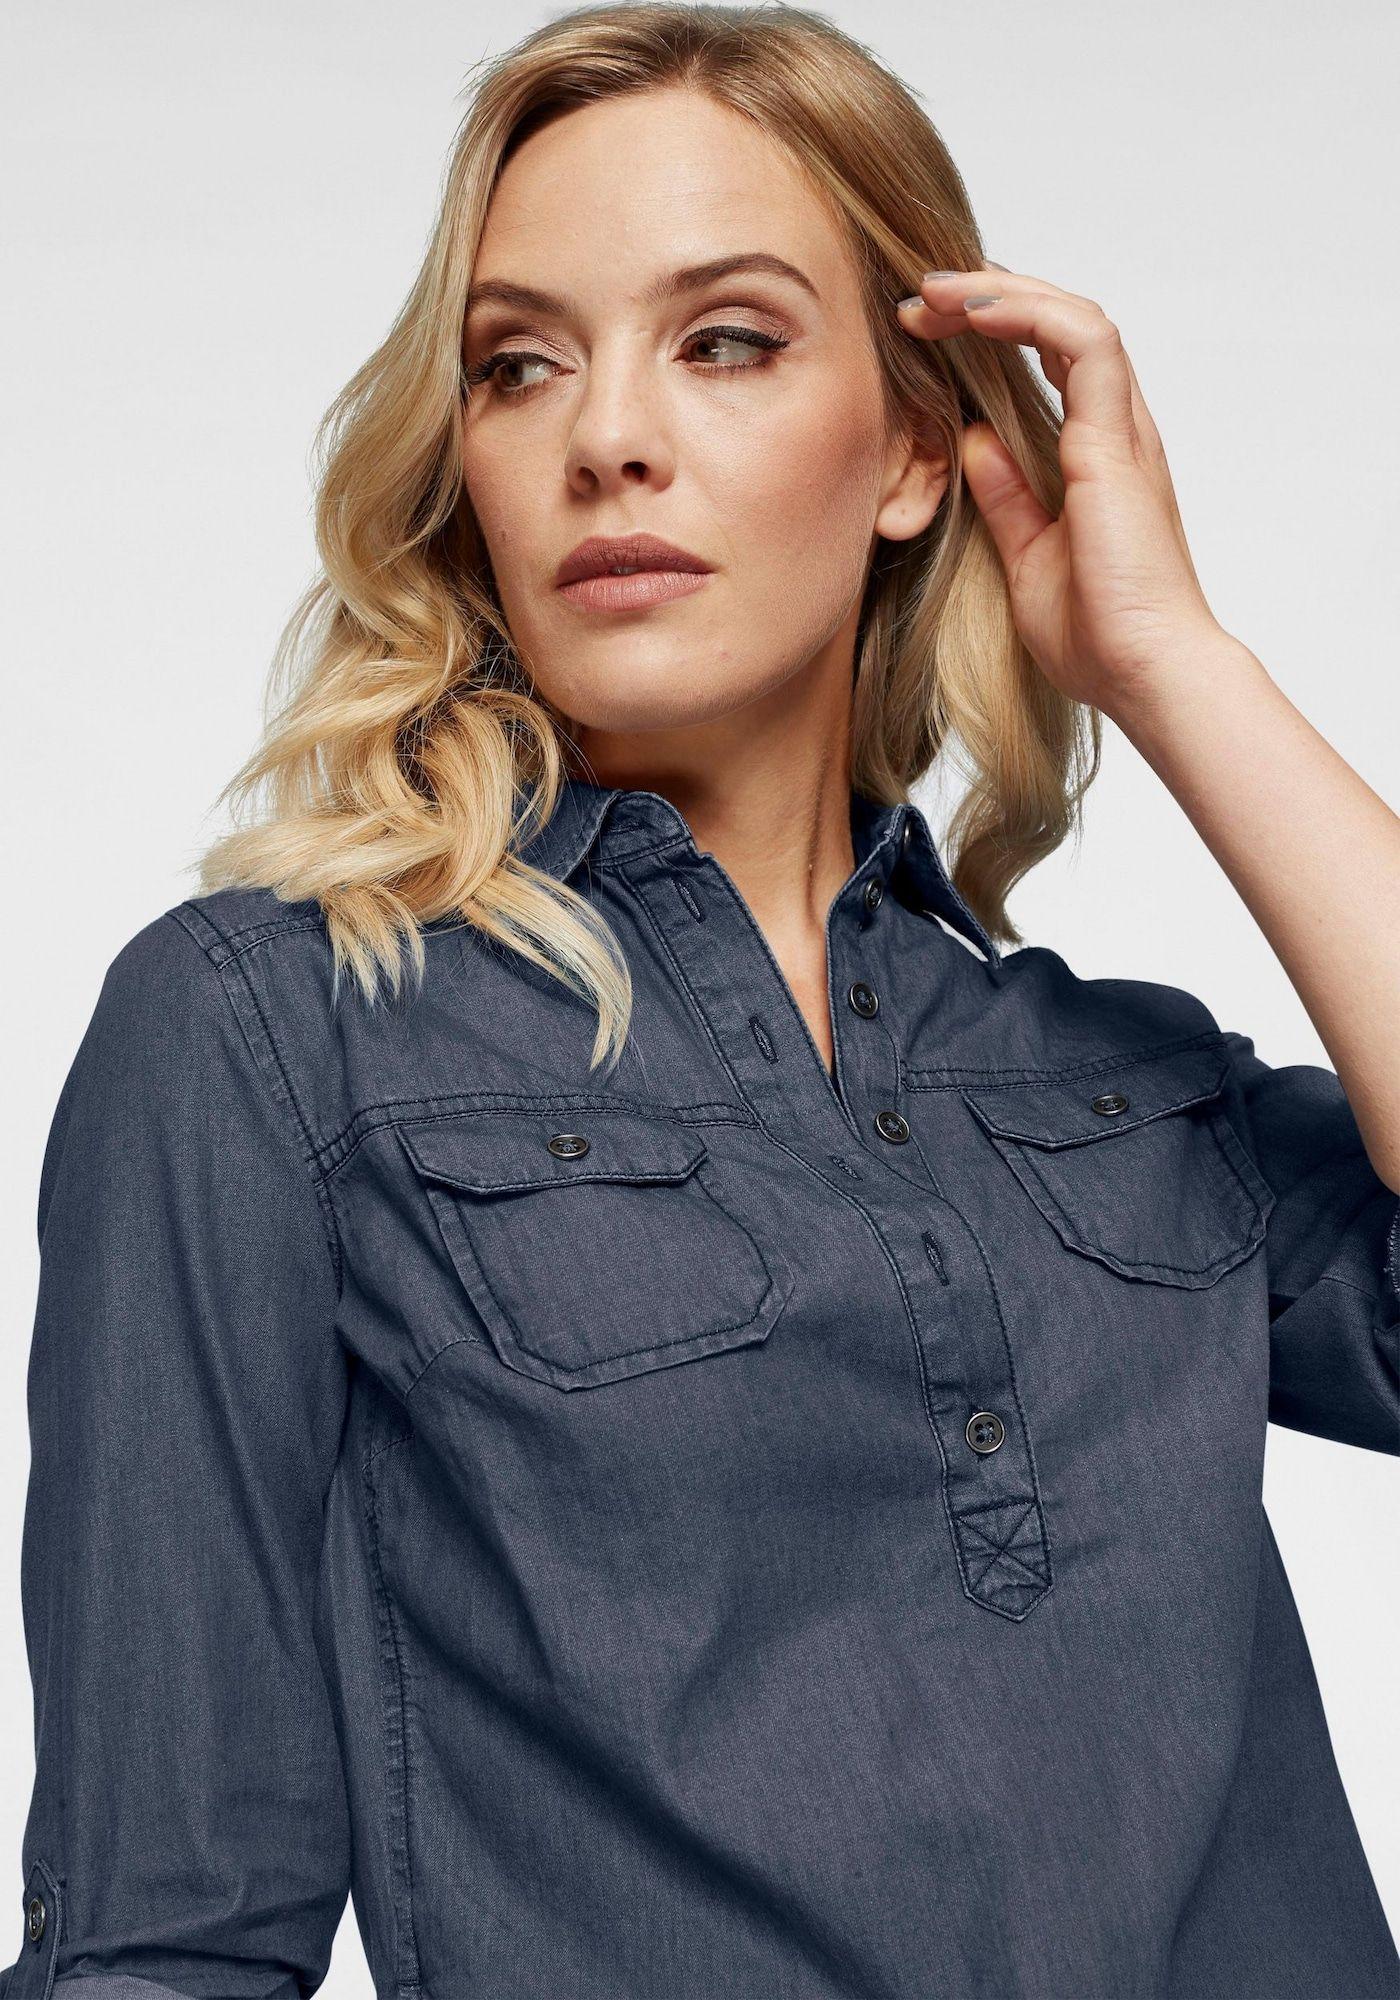 ARIZONA Jeansbluse Damen, Blue Denim, Größe L/XL   Jeans ...